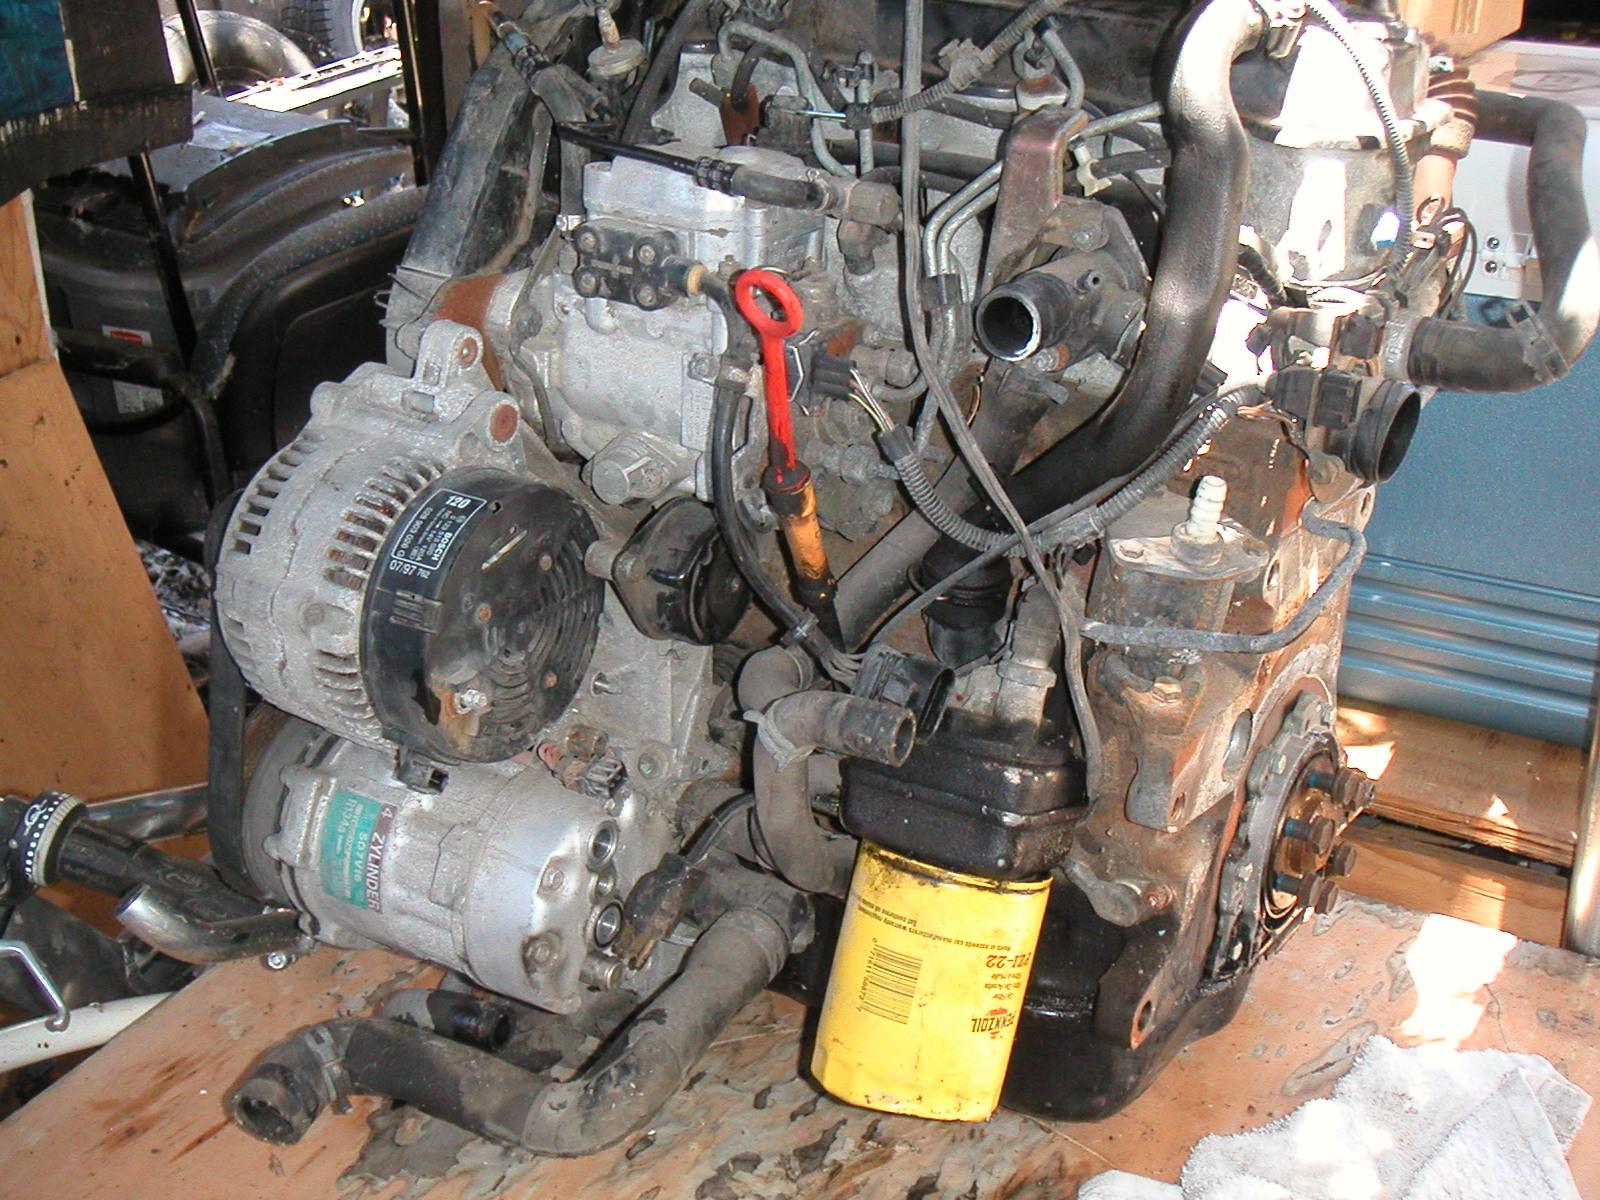 1999 vw passat engine diagram honda civic ignition wiring volkswagen beetle manual